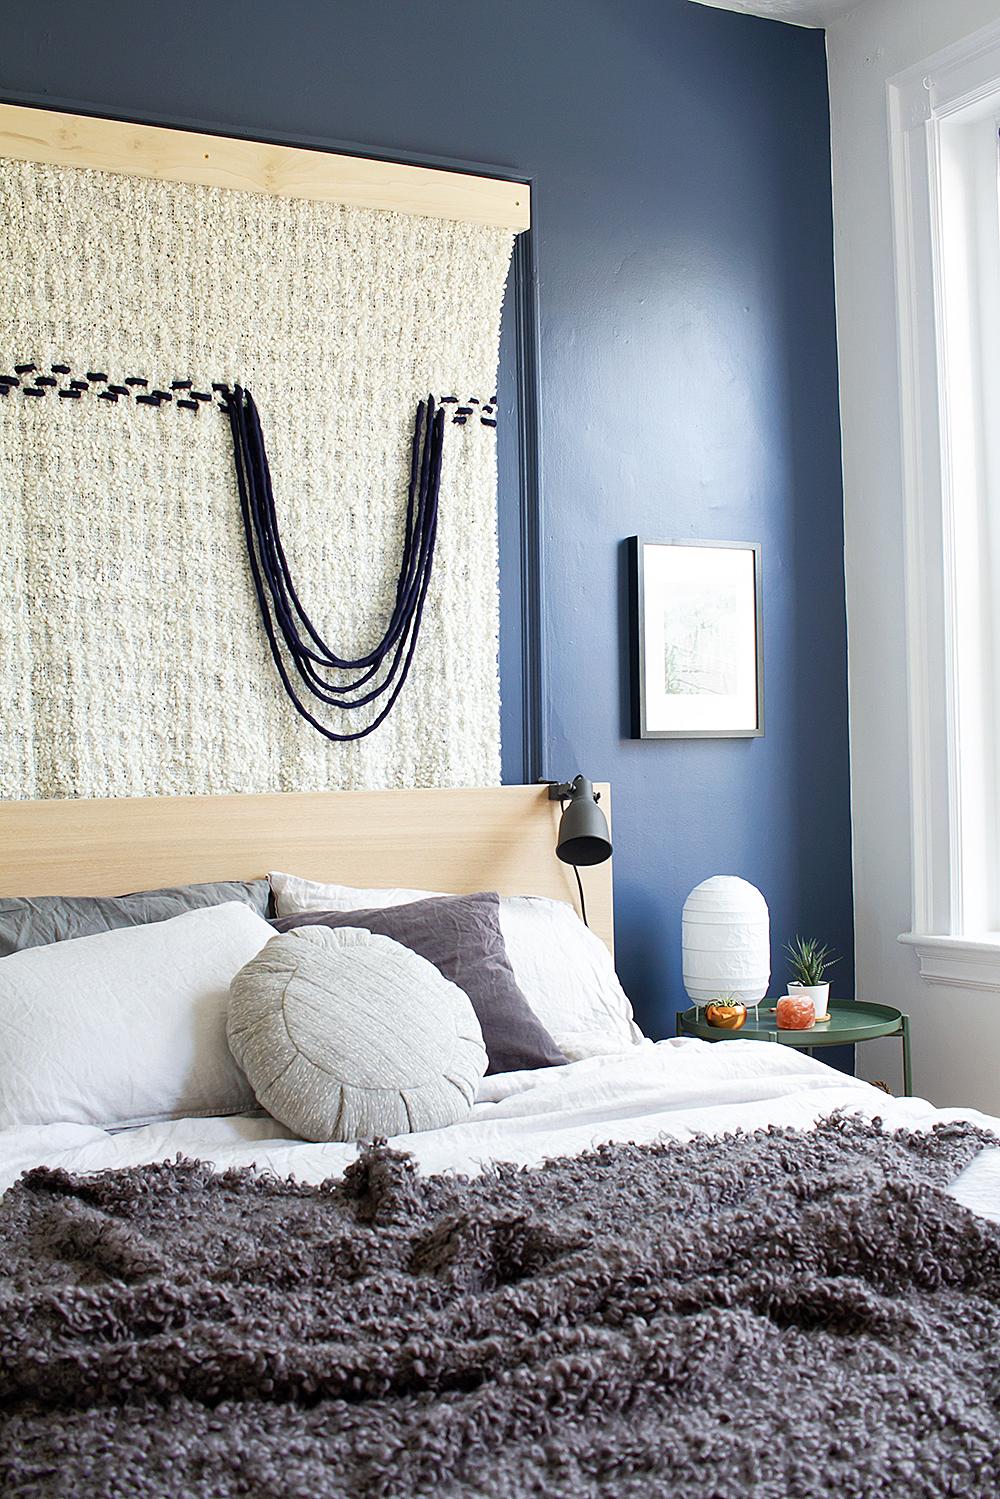 Idle hands awake modern diy design for creatives in for Ikea avon ohio